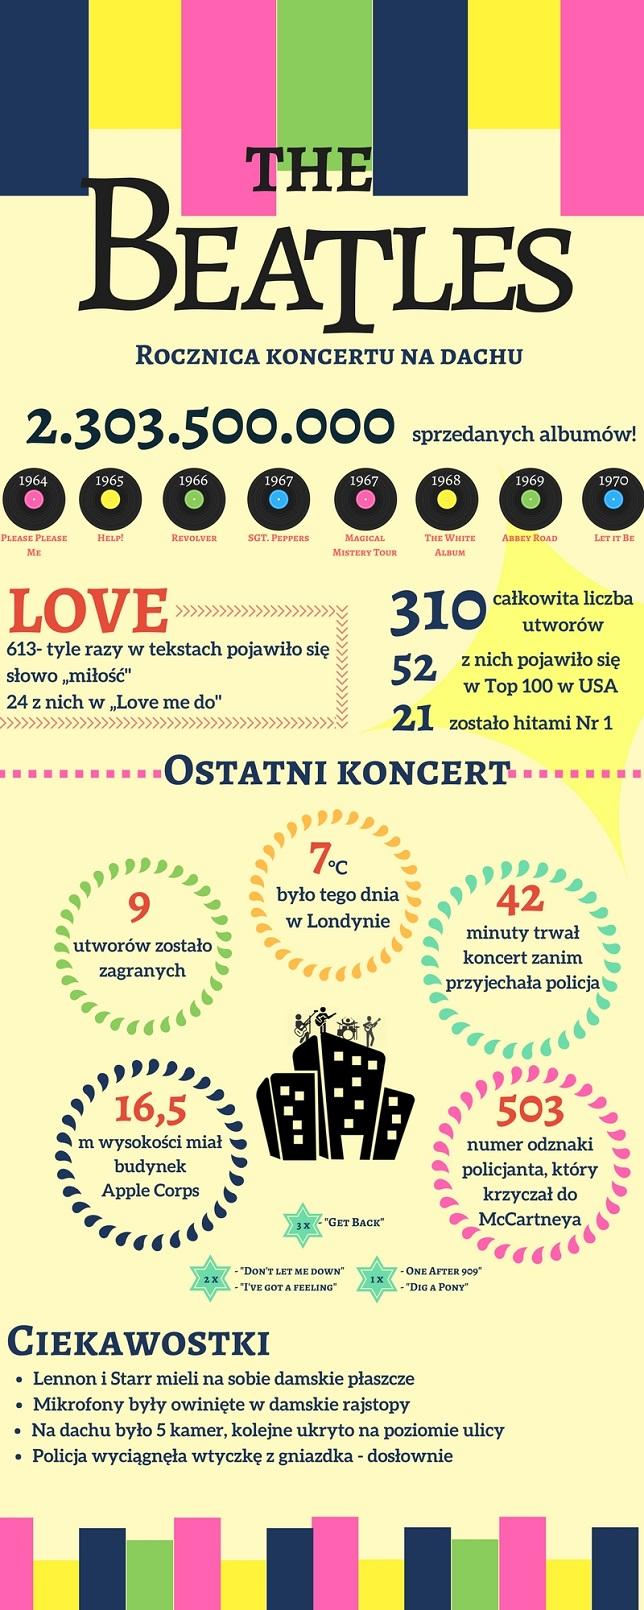 The Beatles Polska: Koncert na dachu graficznie